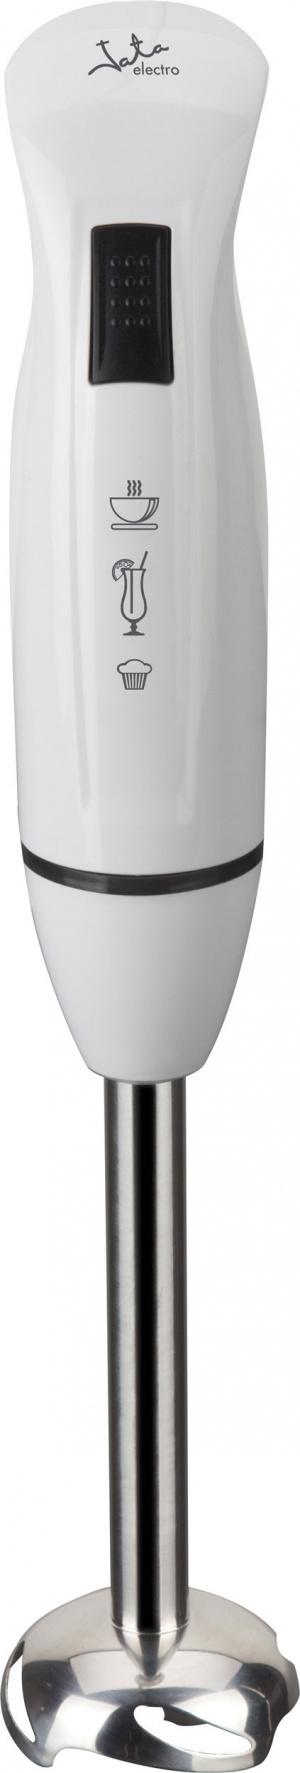 BATIDORA  VARILLA JATA BT126 400W 1